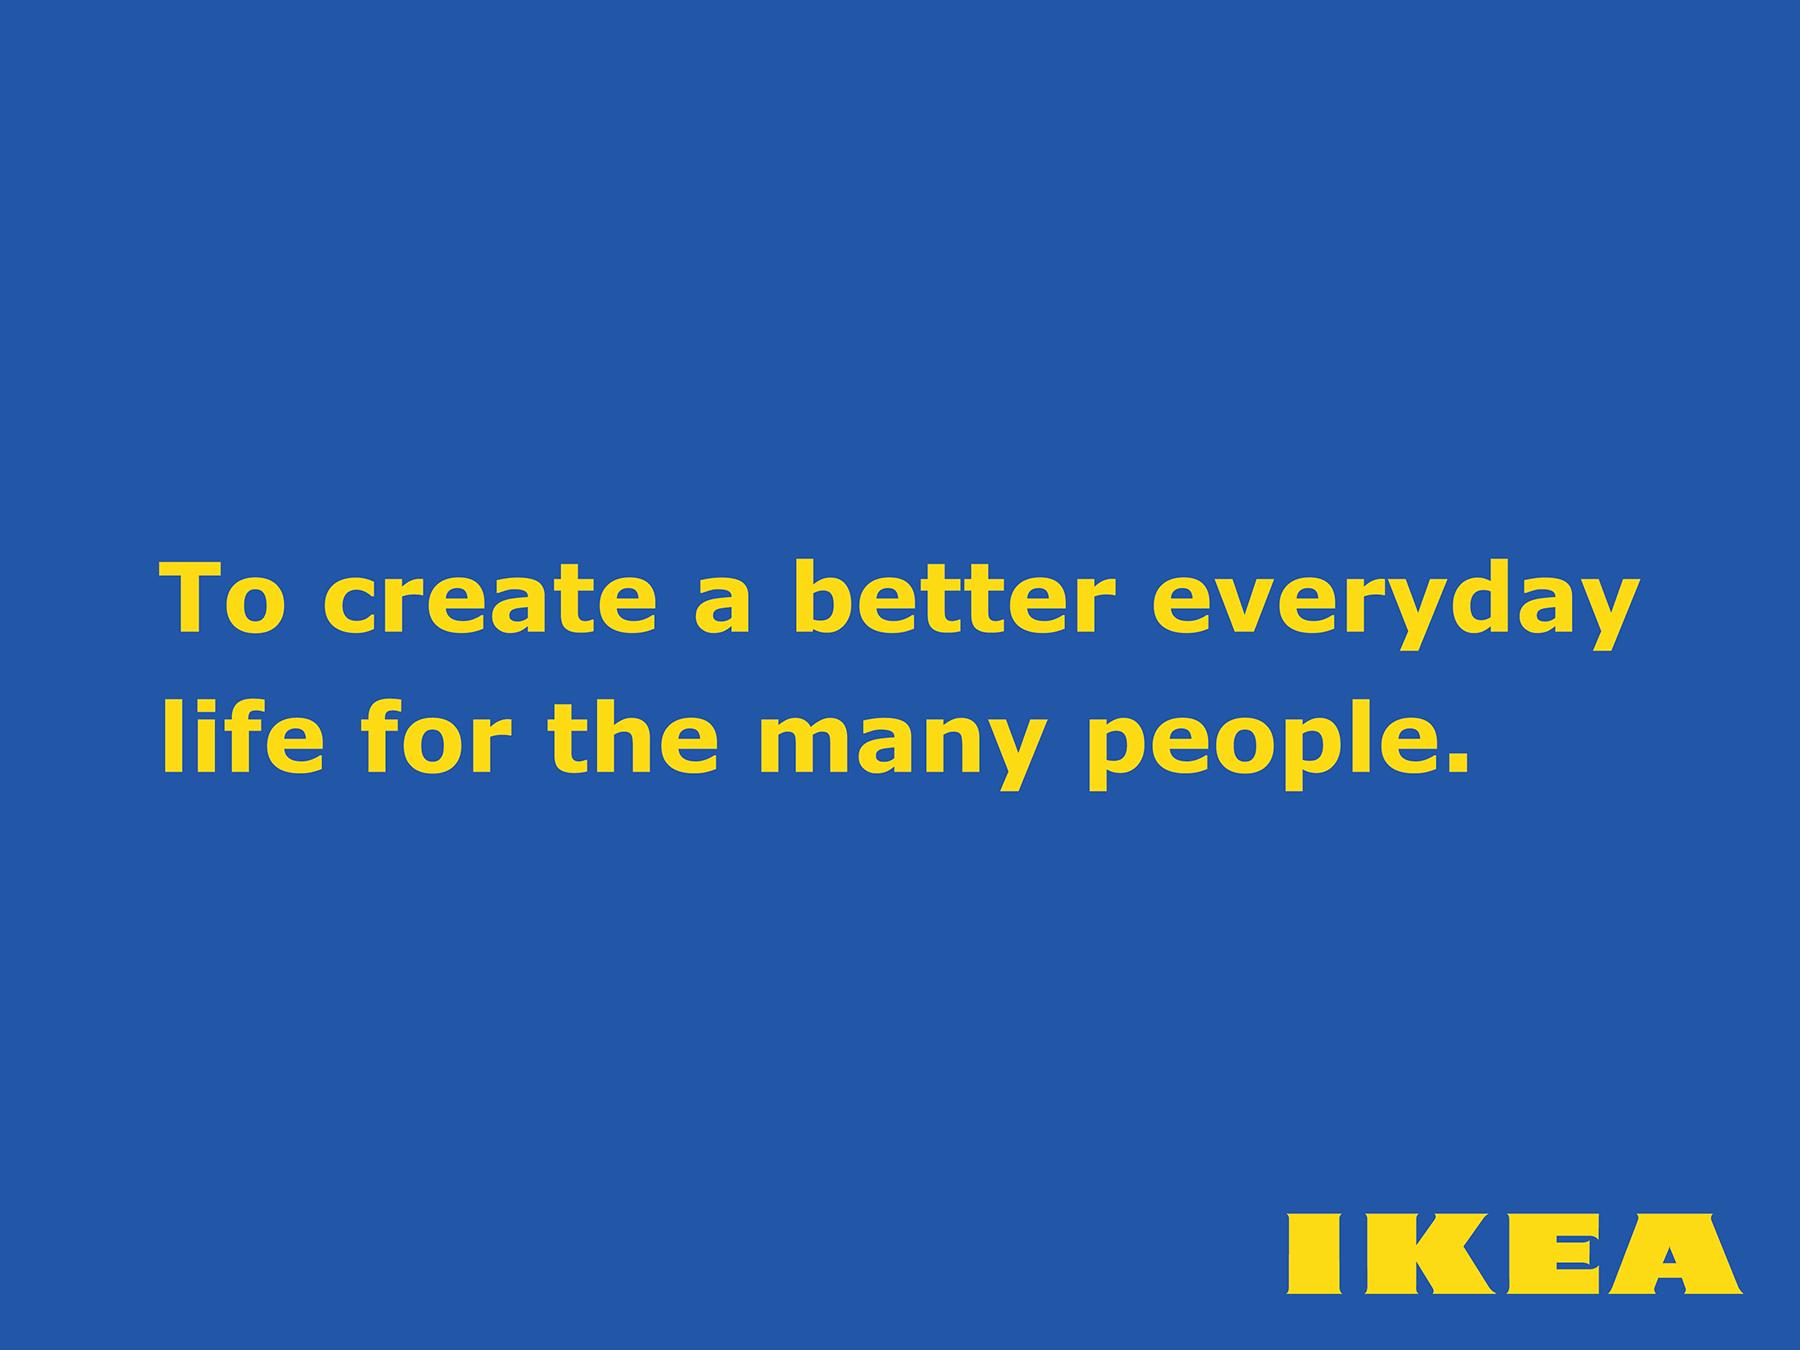 IKEA brand promise